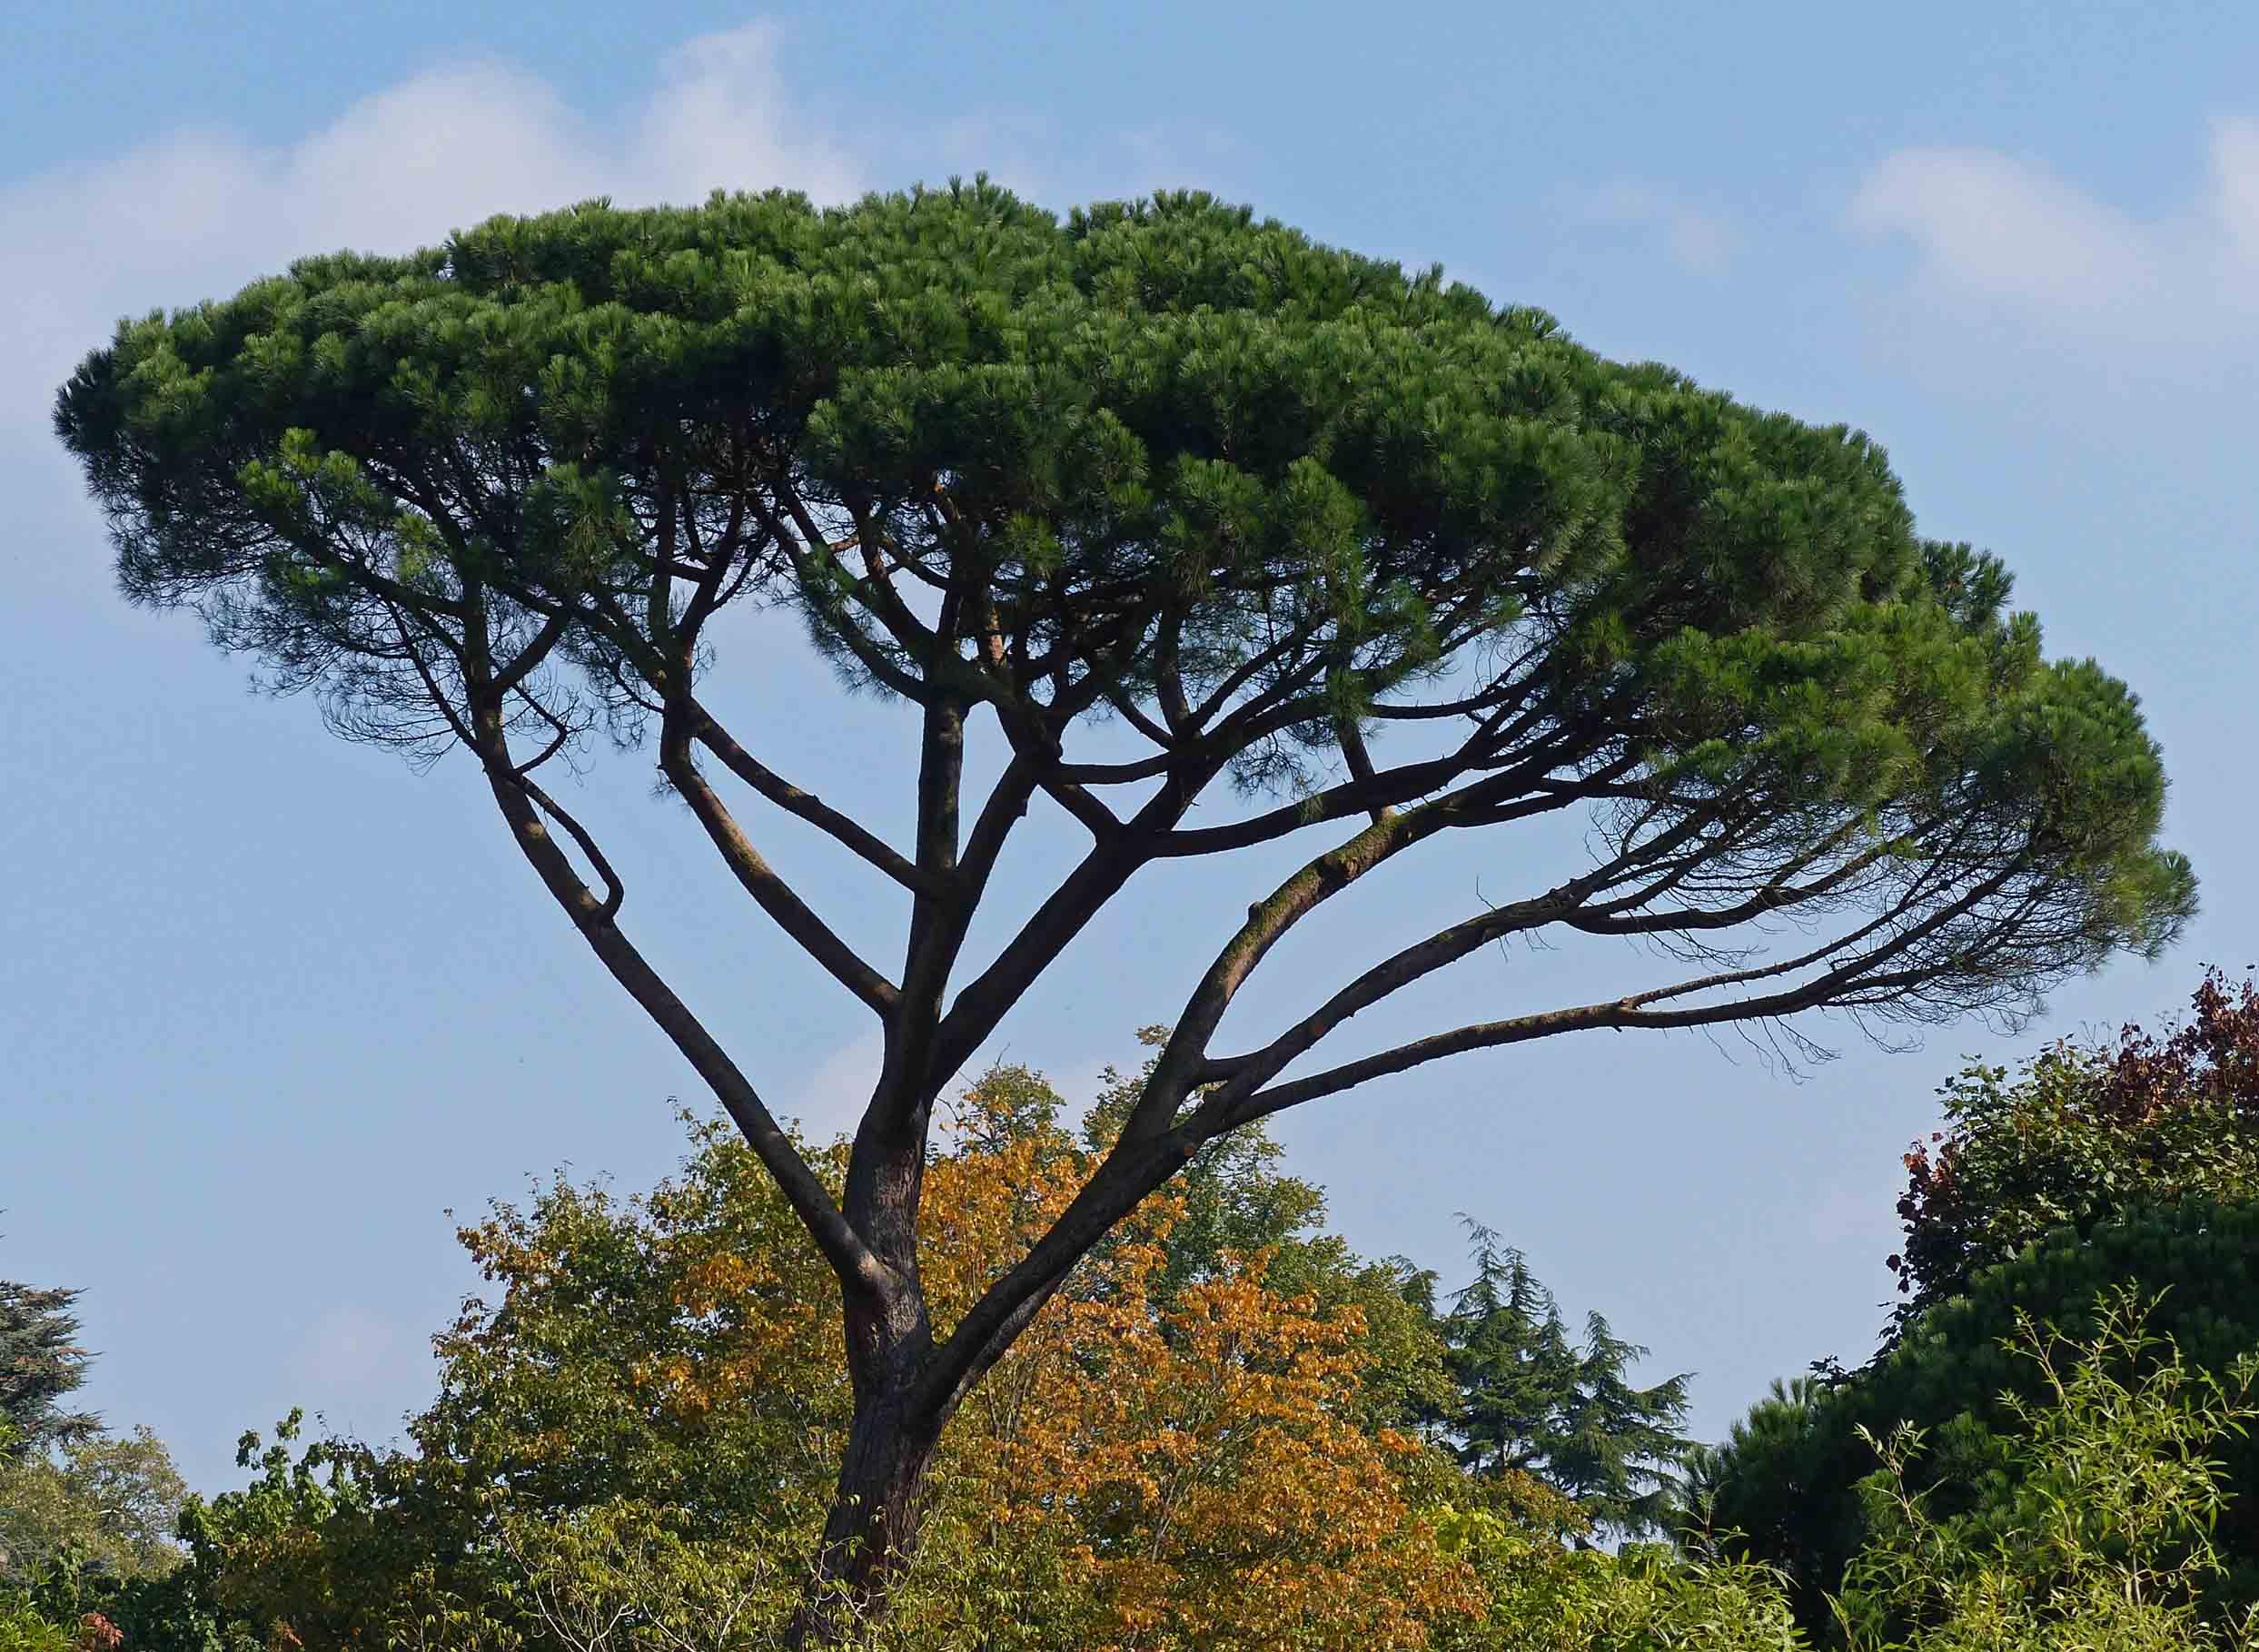 Umbrella shaped pine tree